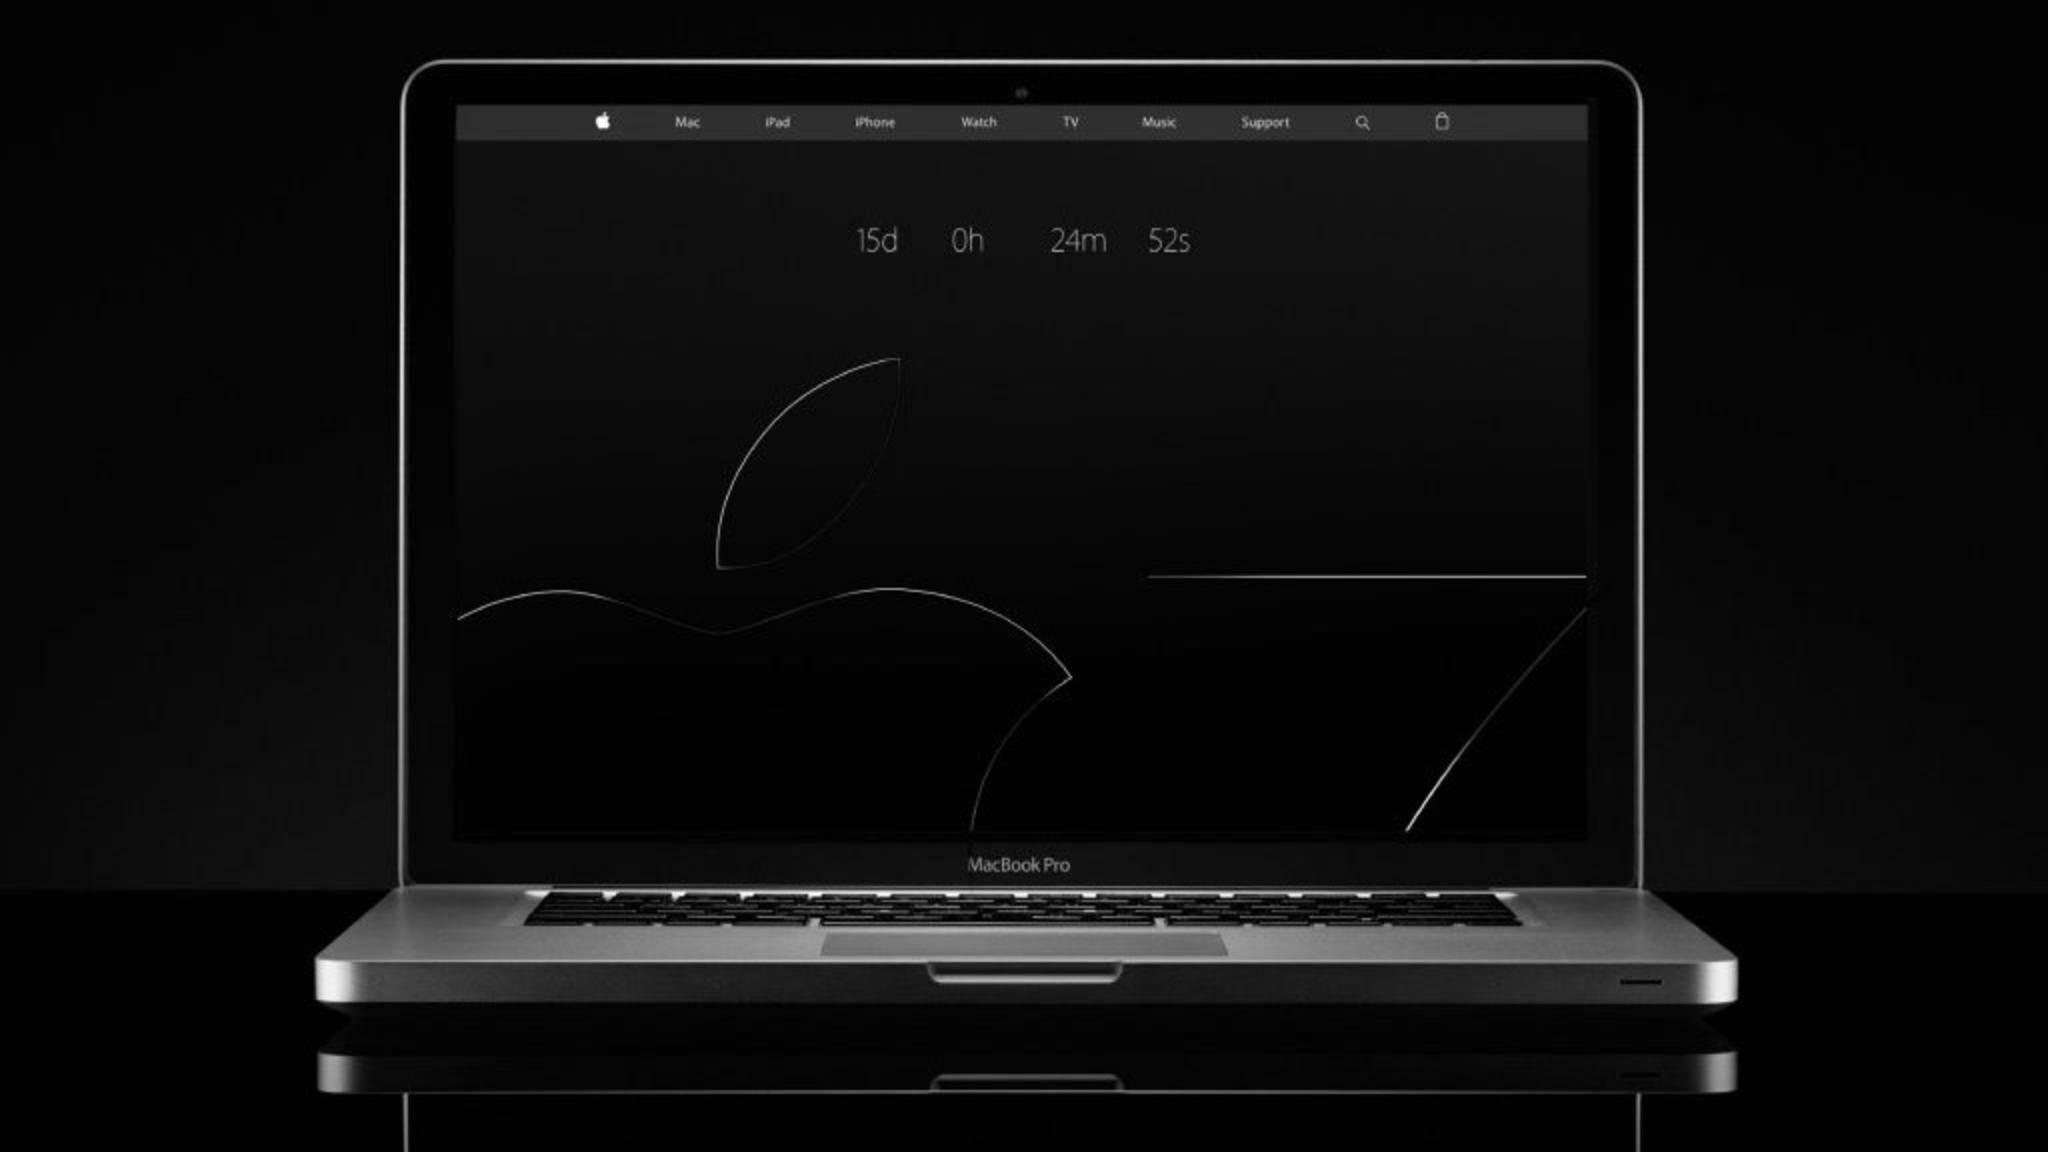 iPhone-7-Apple-website-conc